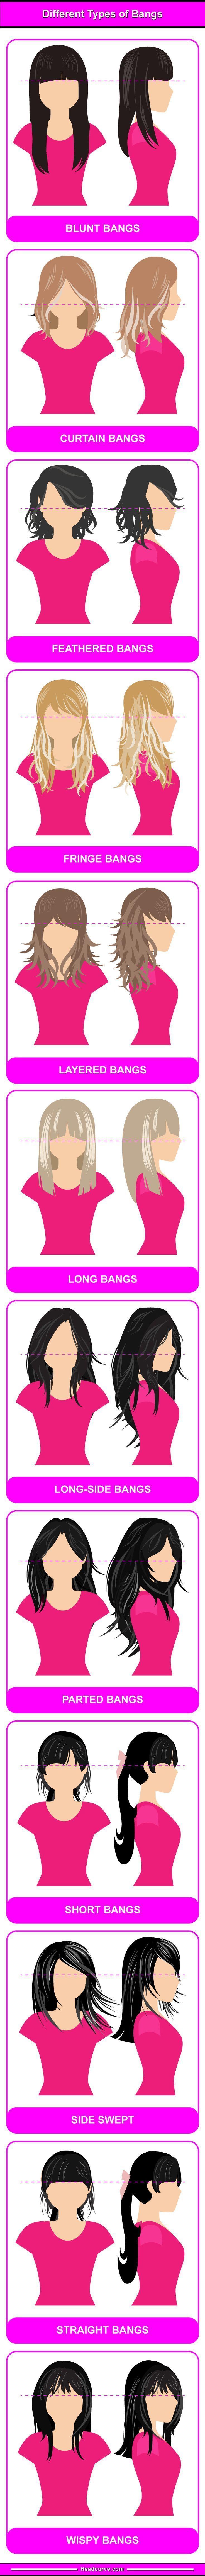 Tabelle Mit Den Verschiedenen Arten Von Pony Fur Frauen Frisur Typen Frisuren Ideen Arten Den Medium Frisuren Frauen Haar Pony Halblange Kurze Haare